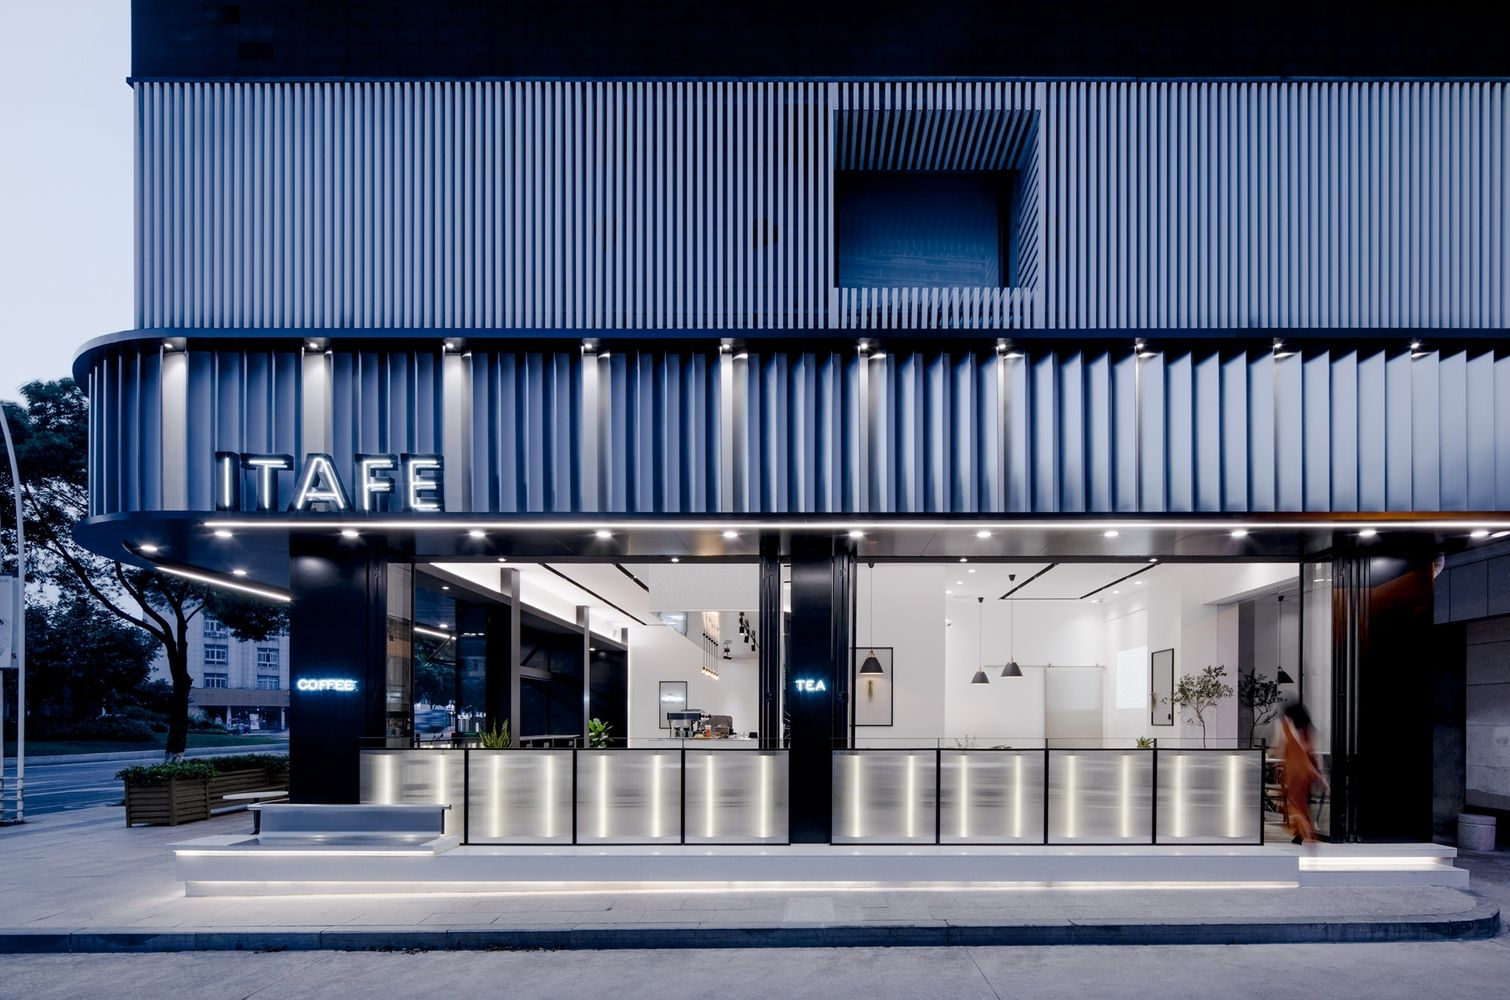 Itafe Coffee & Drinking Store Daylab Studio